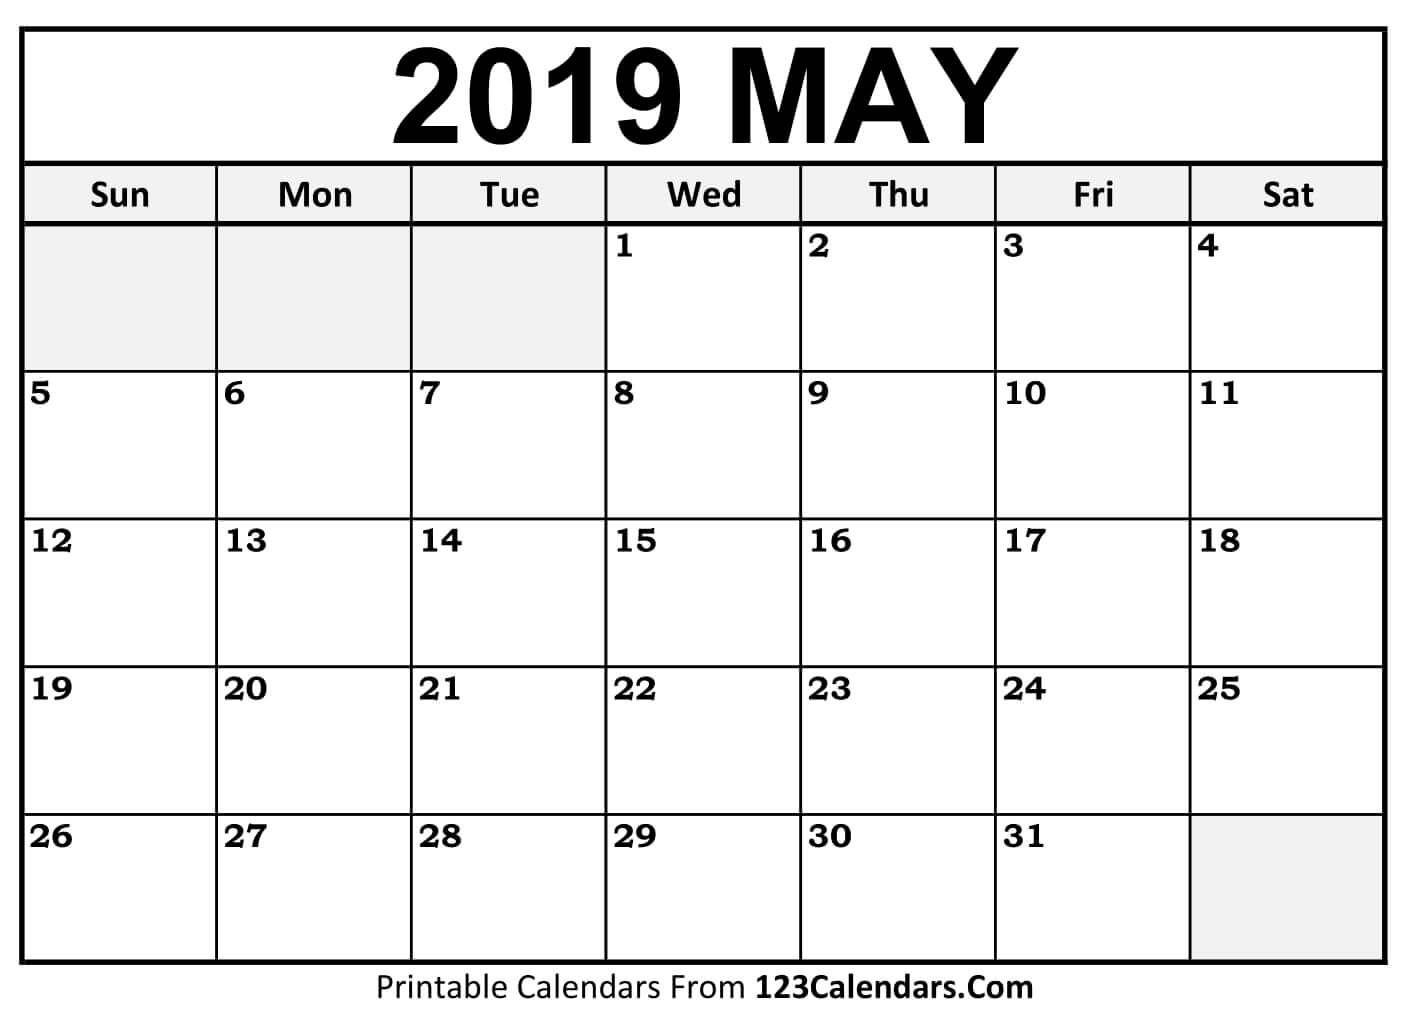 May 2019 Calendar Printable Template Blank Editable Word Pdf Excel